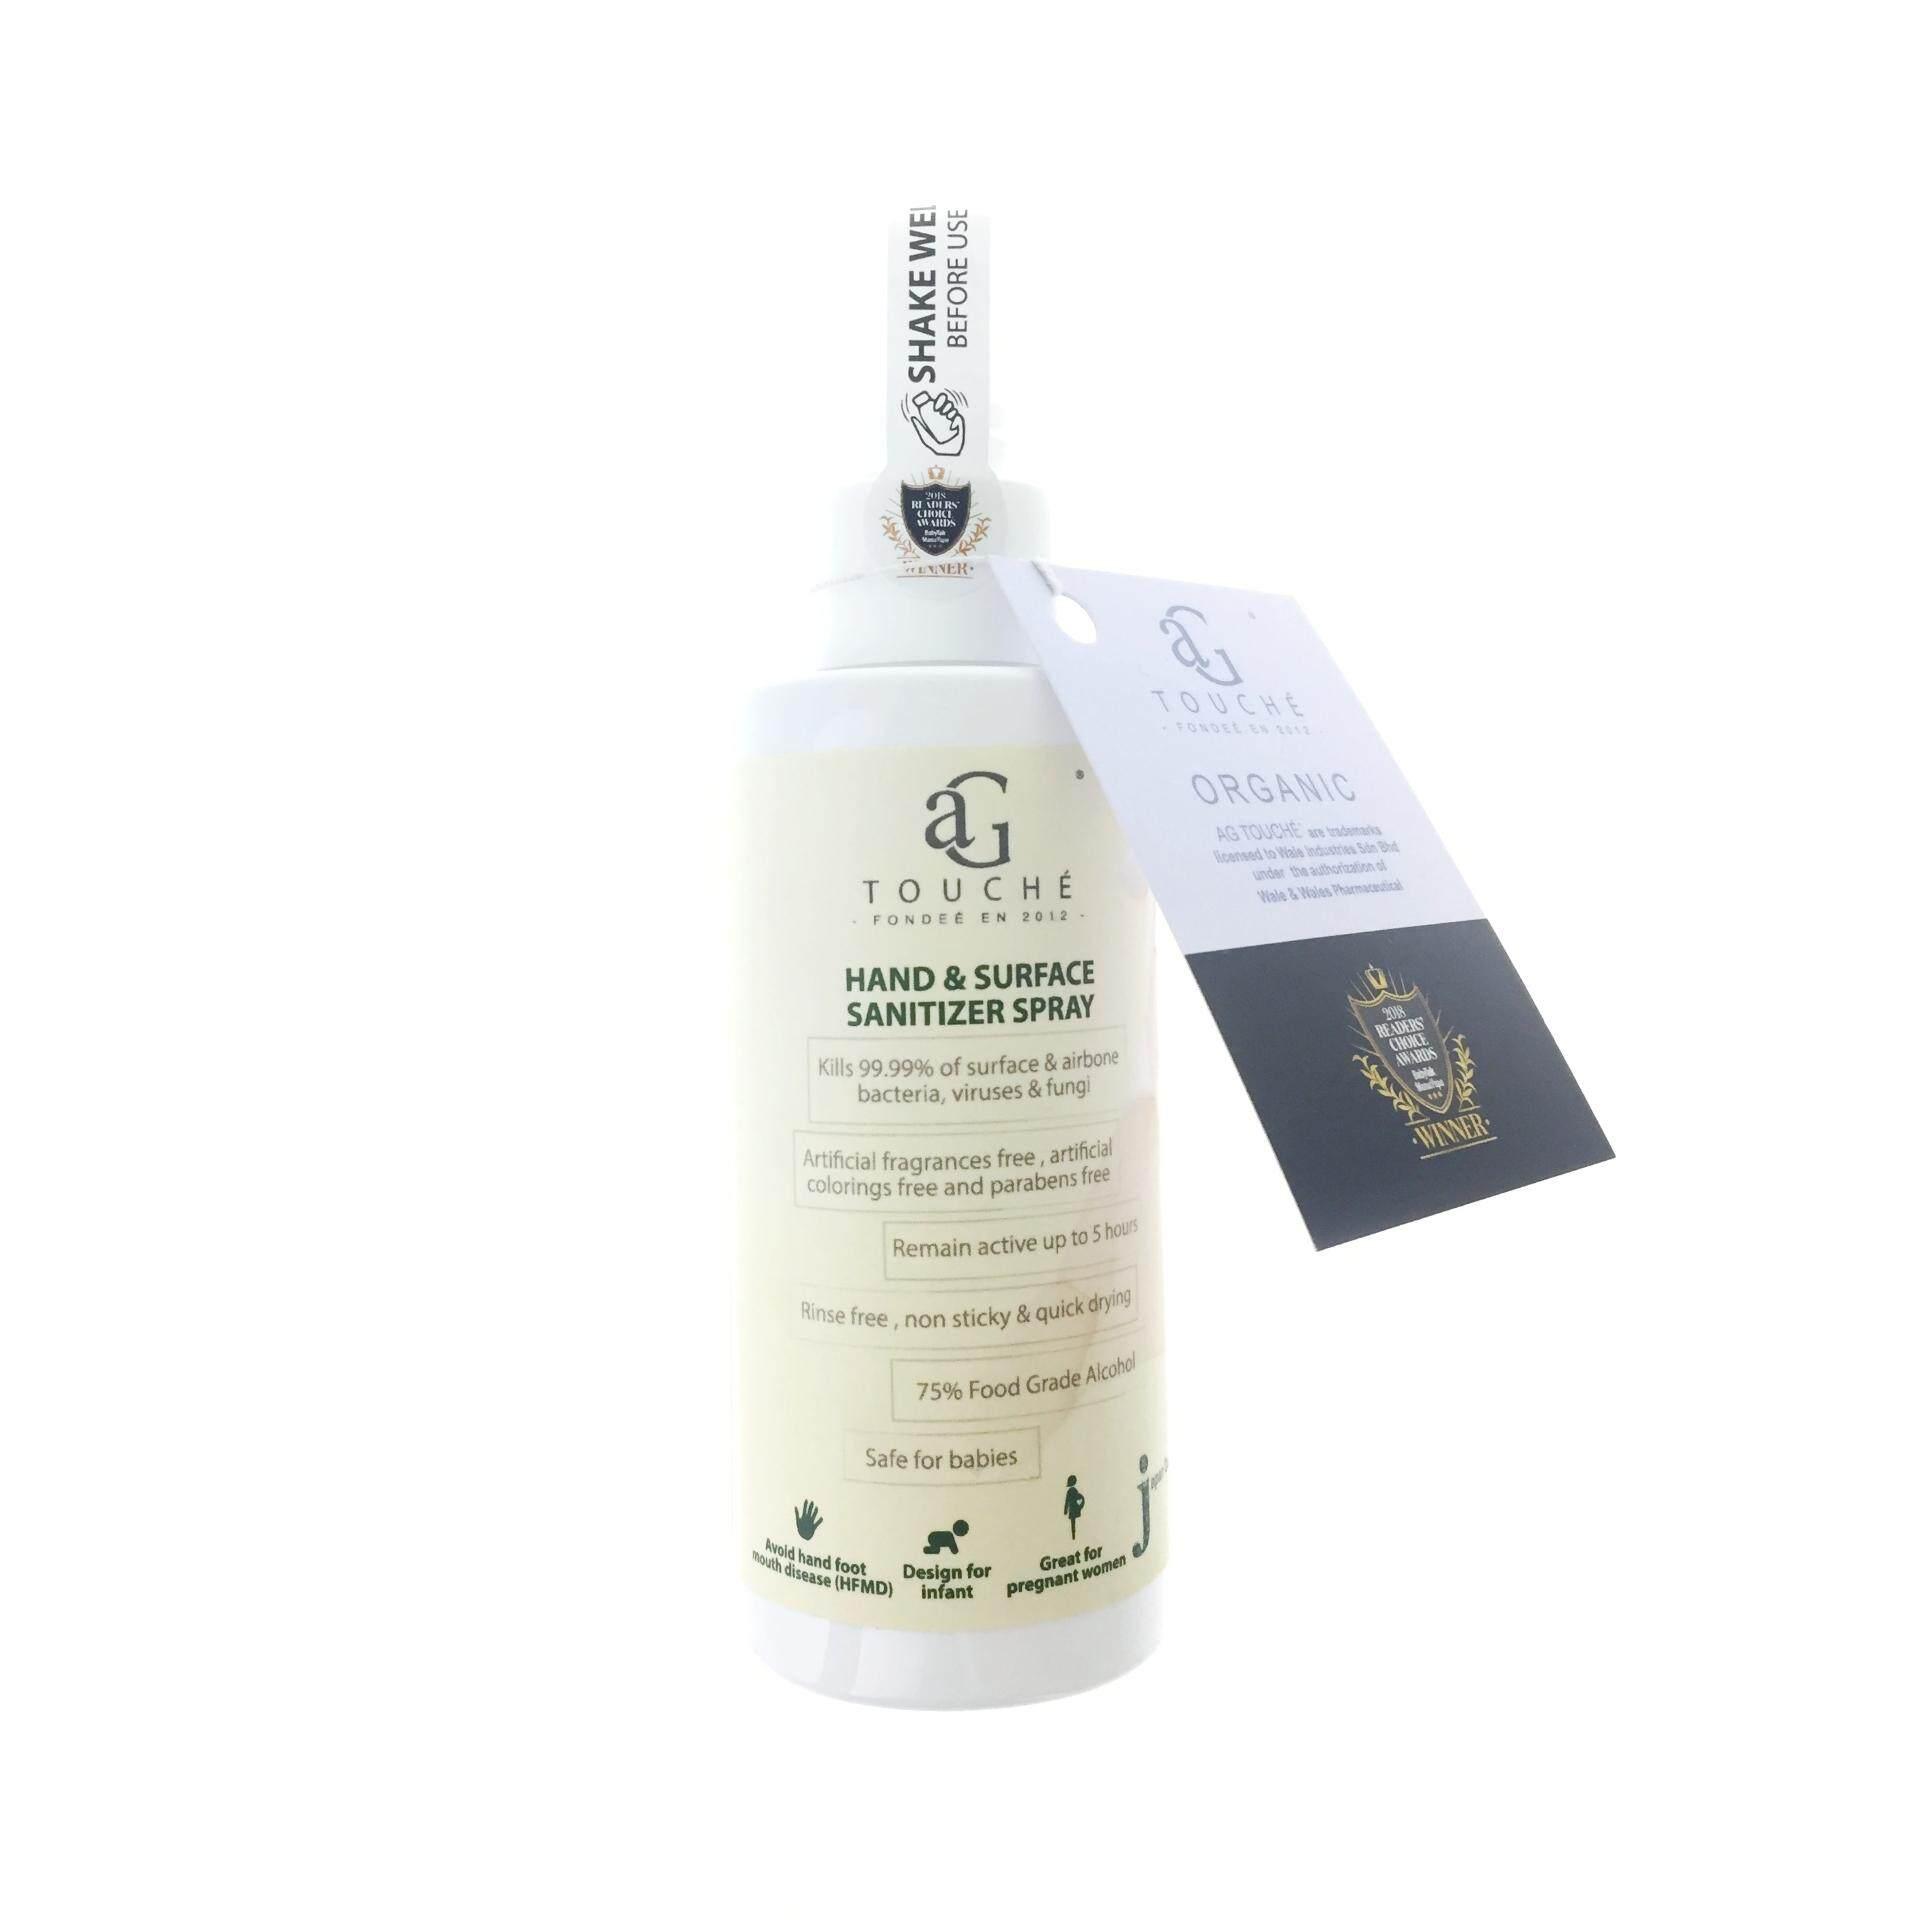 AG Touché Hand & Surface Sanitizer Spray 120ml (1 bottle)